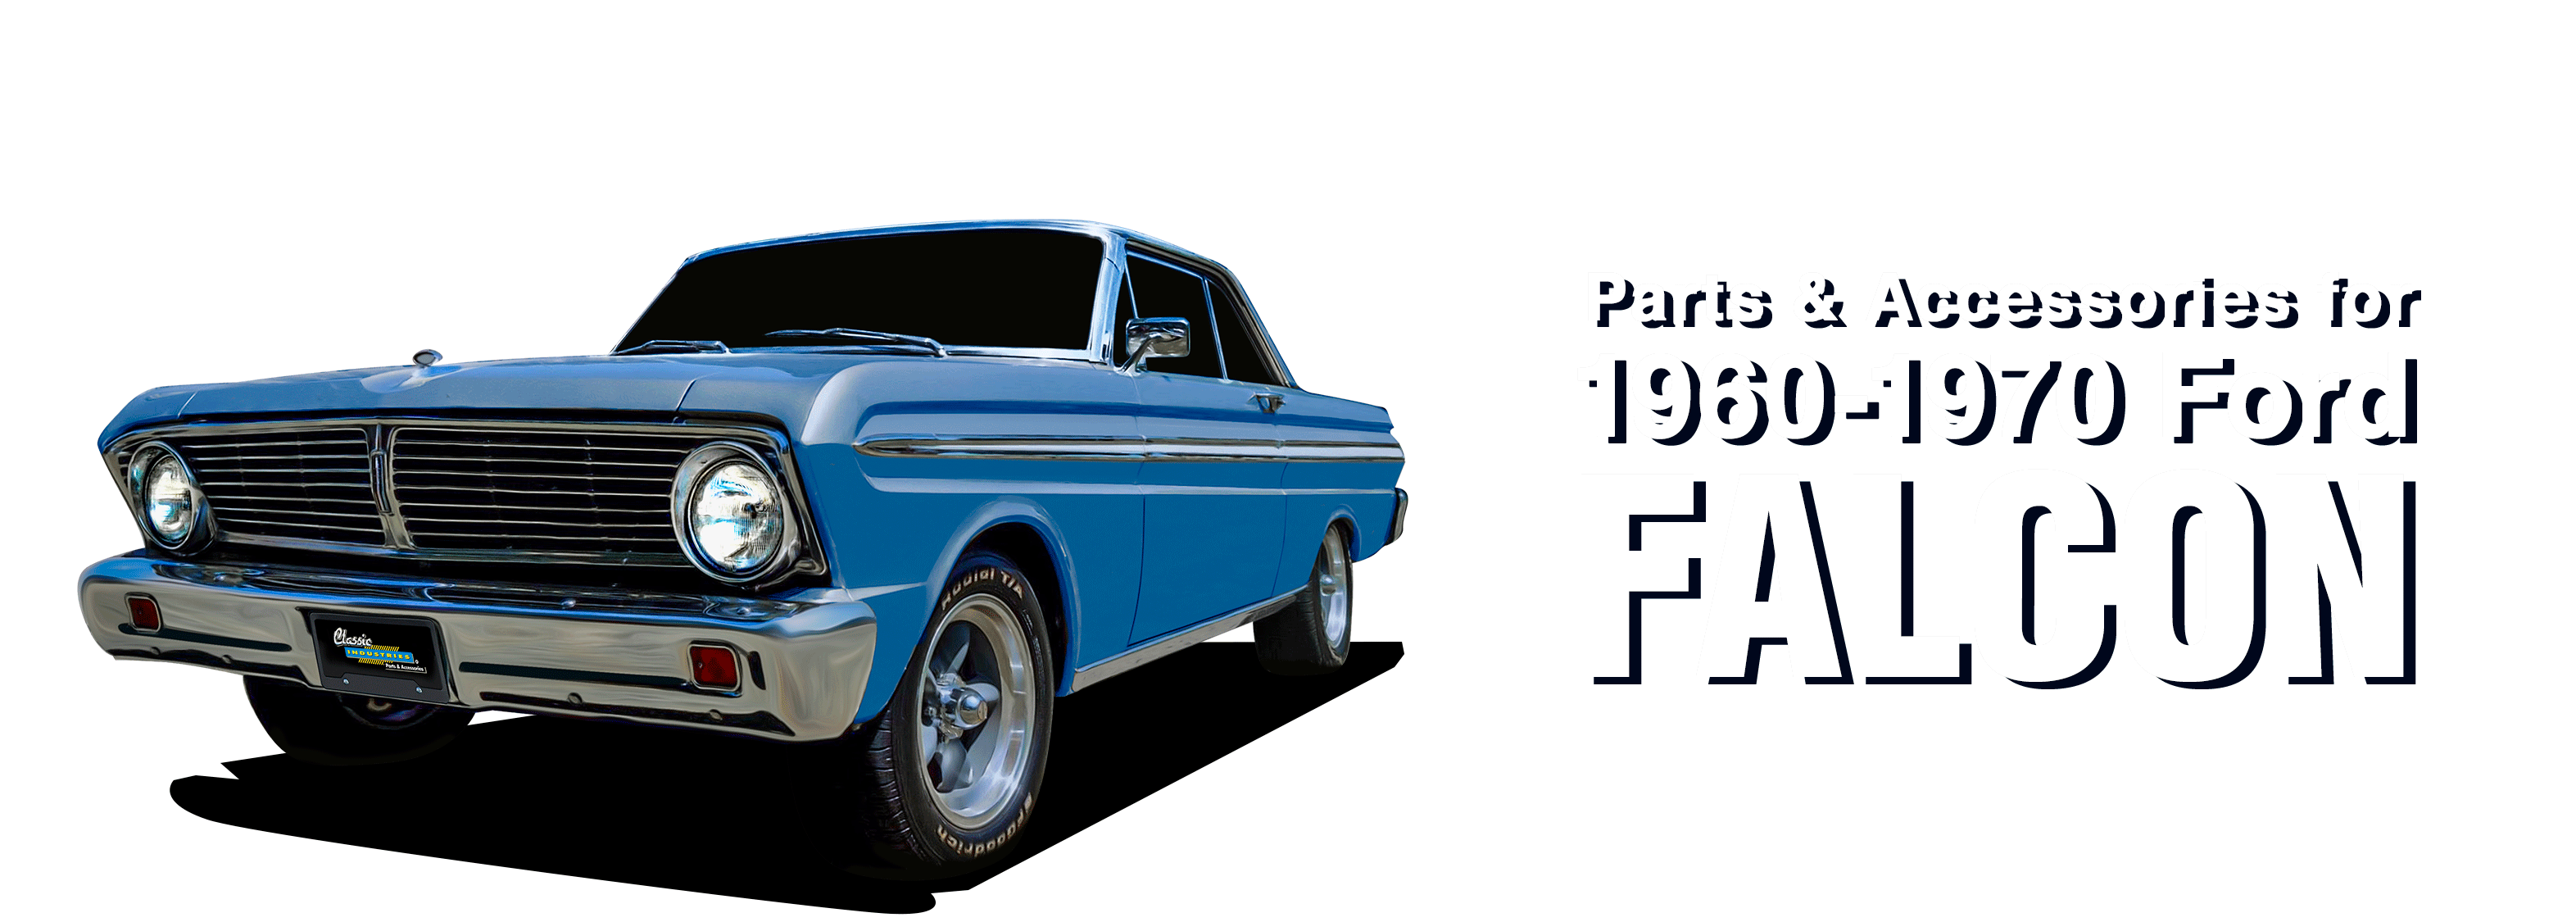 Ford-Falcon-vehicle-desktop_v2